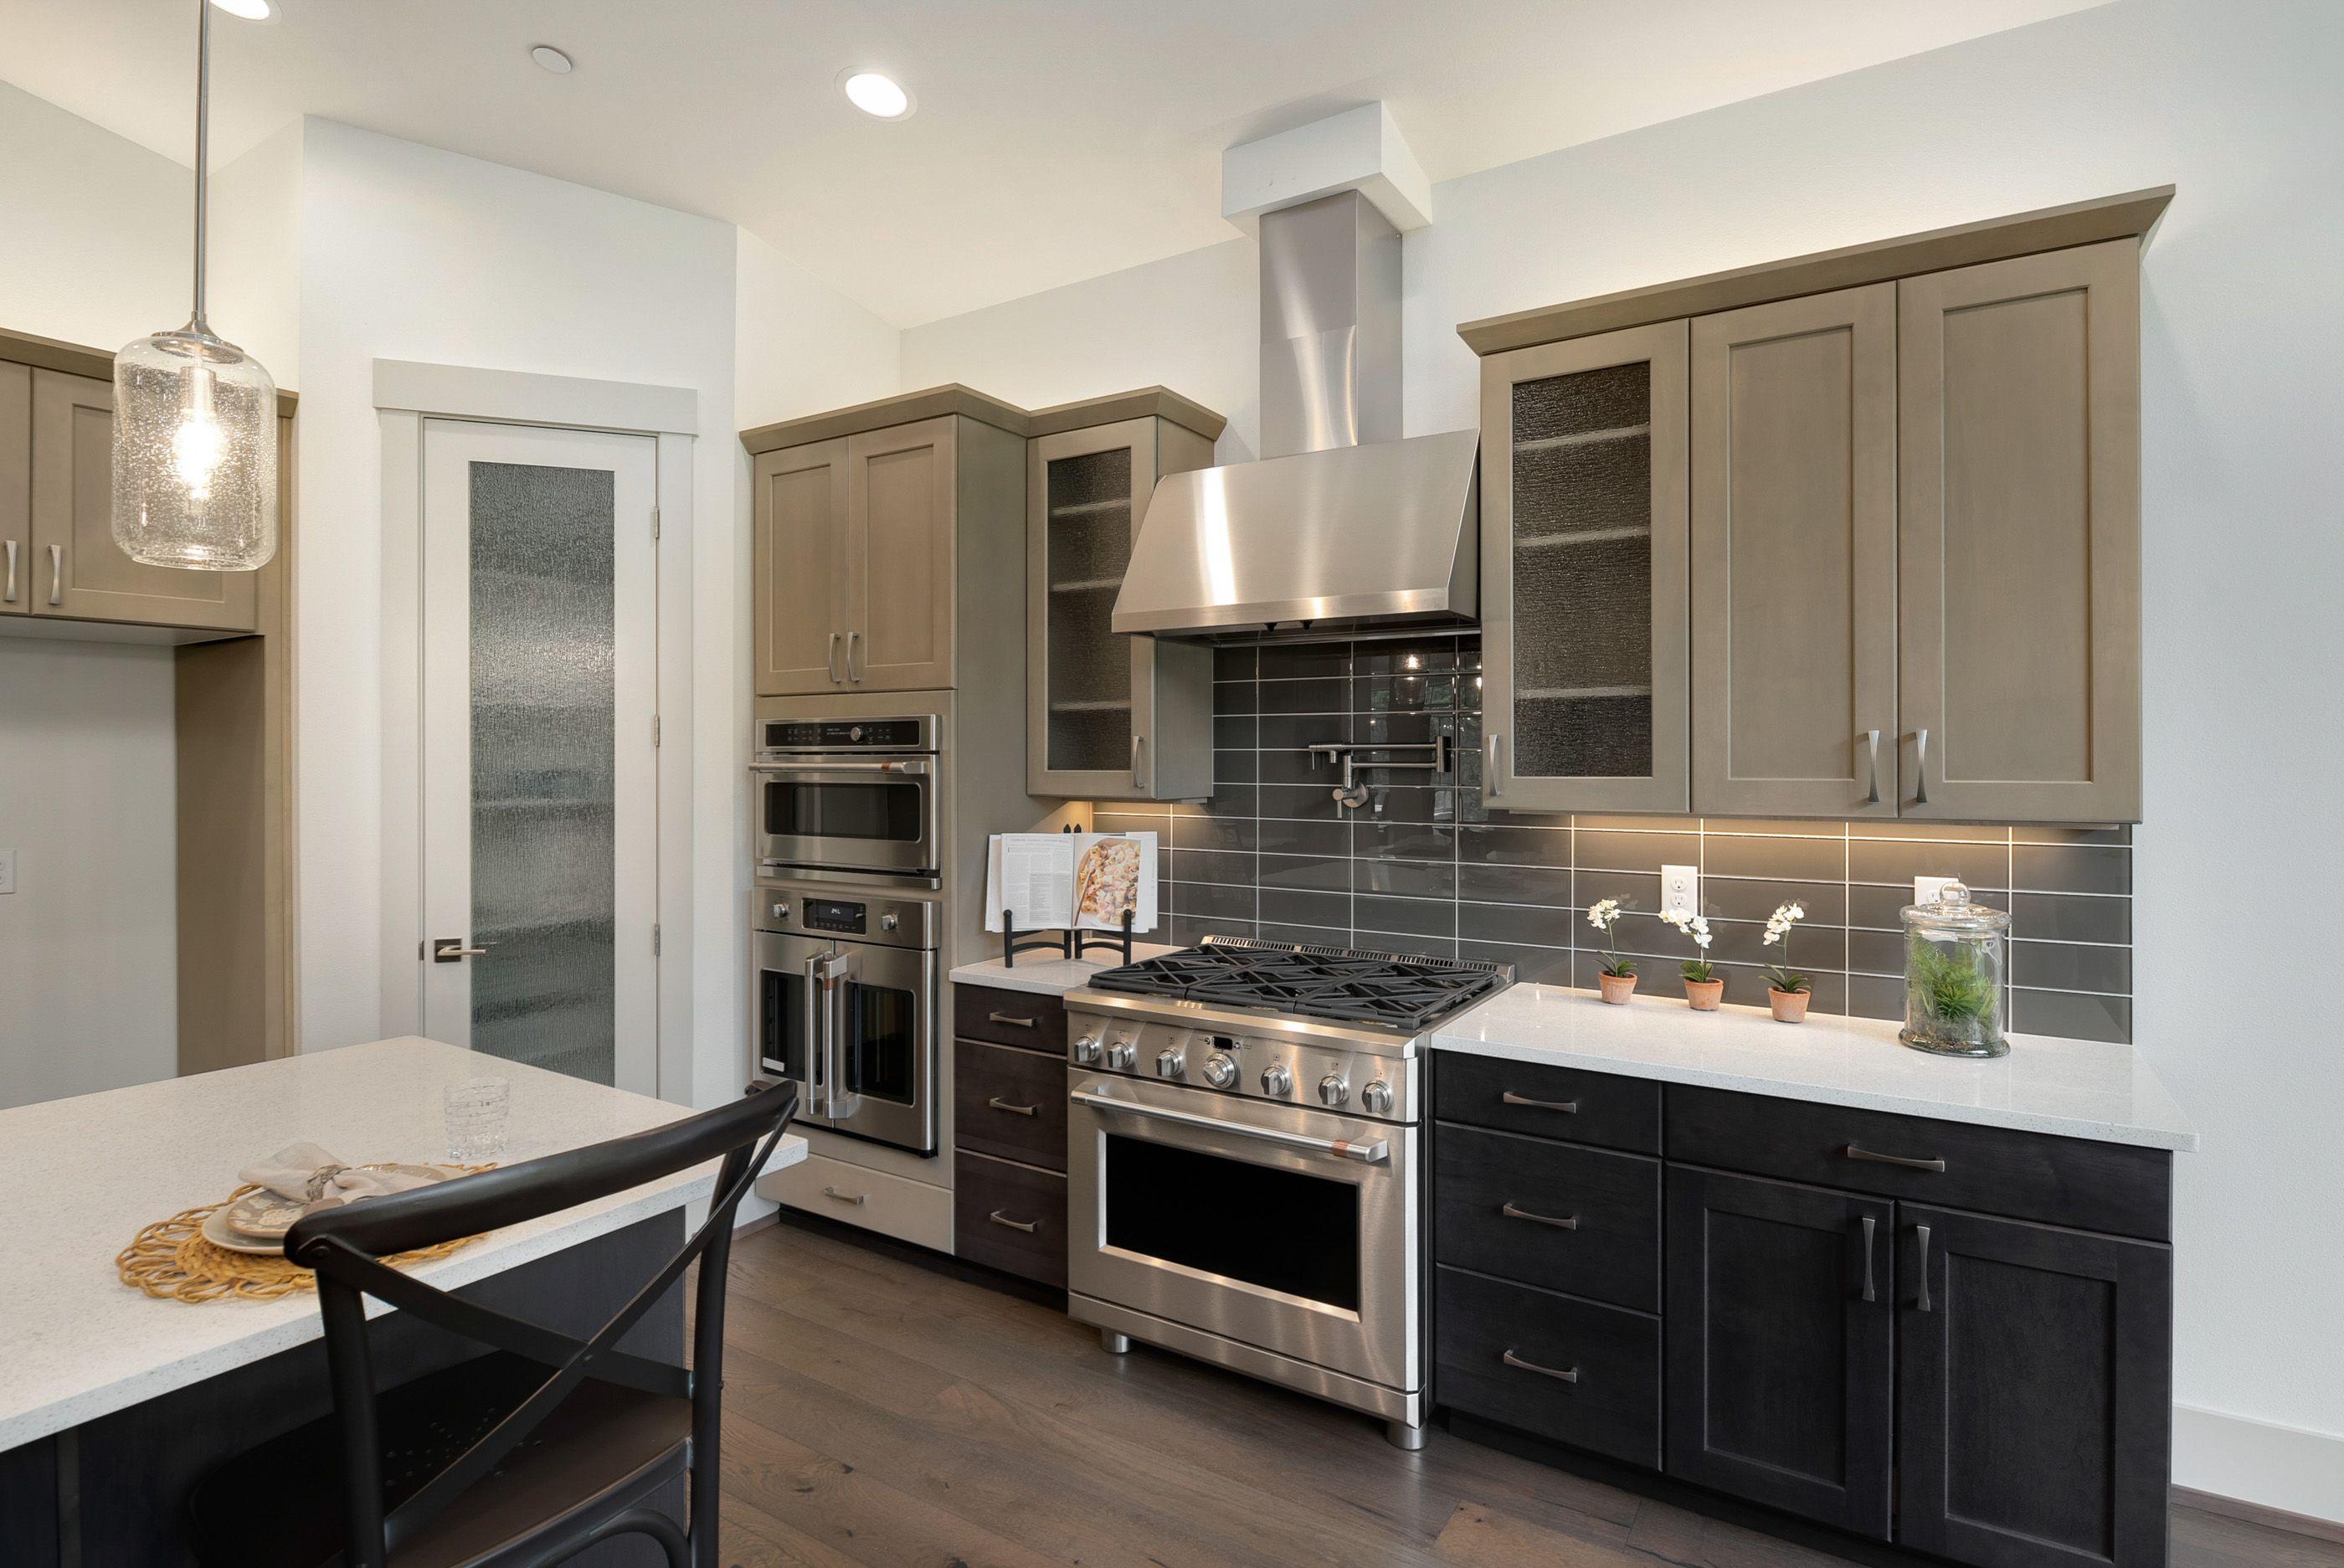 Kitchen featured in the Plan 164 By Schneider Family Homes in Seattle-Bellevue, WA